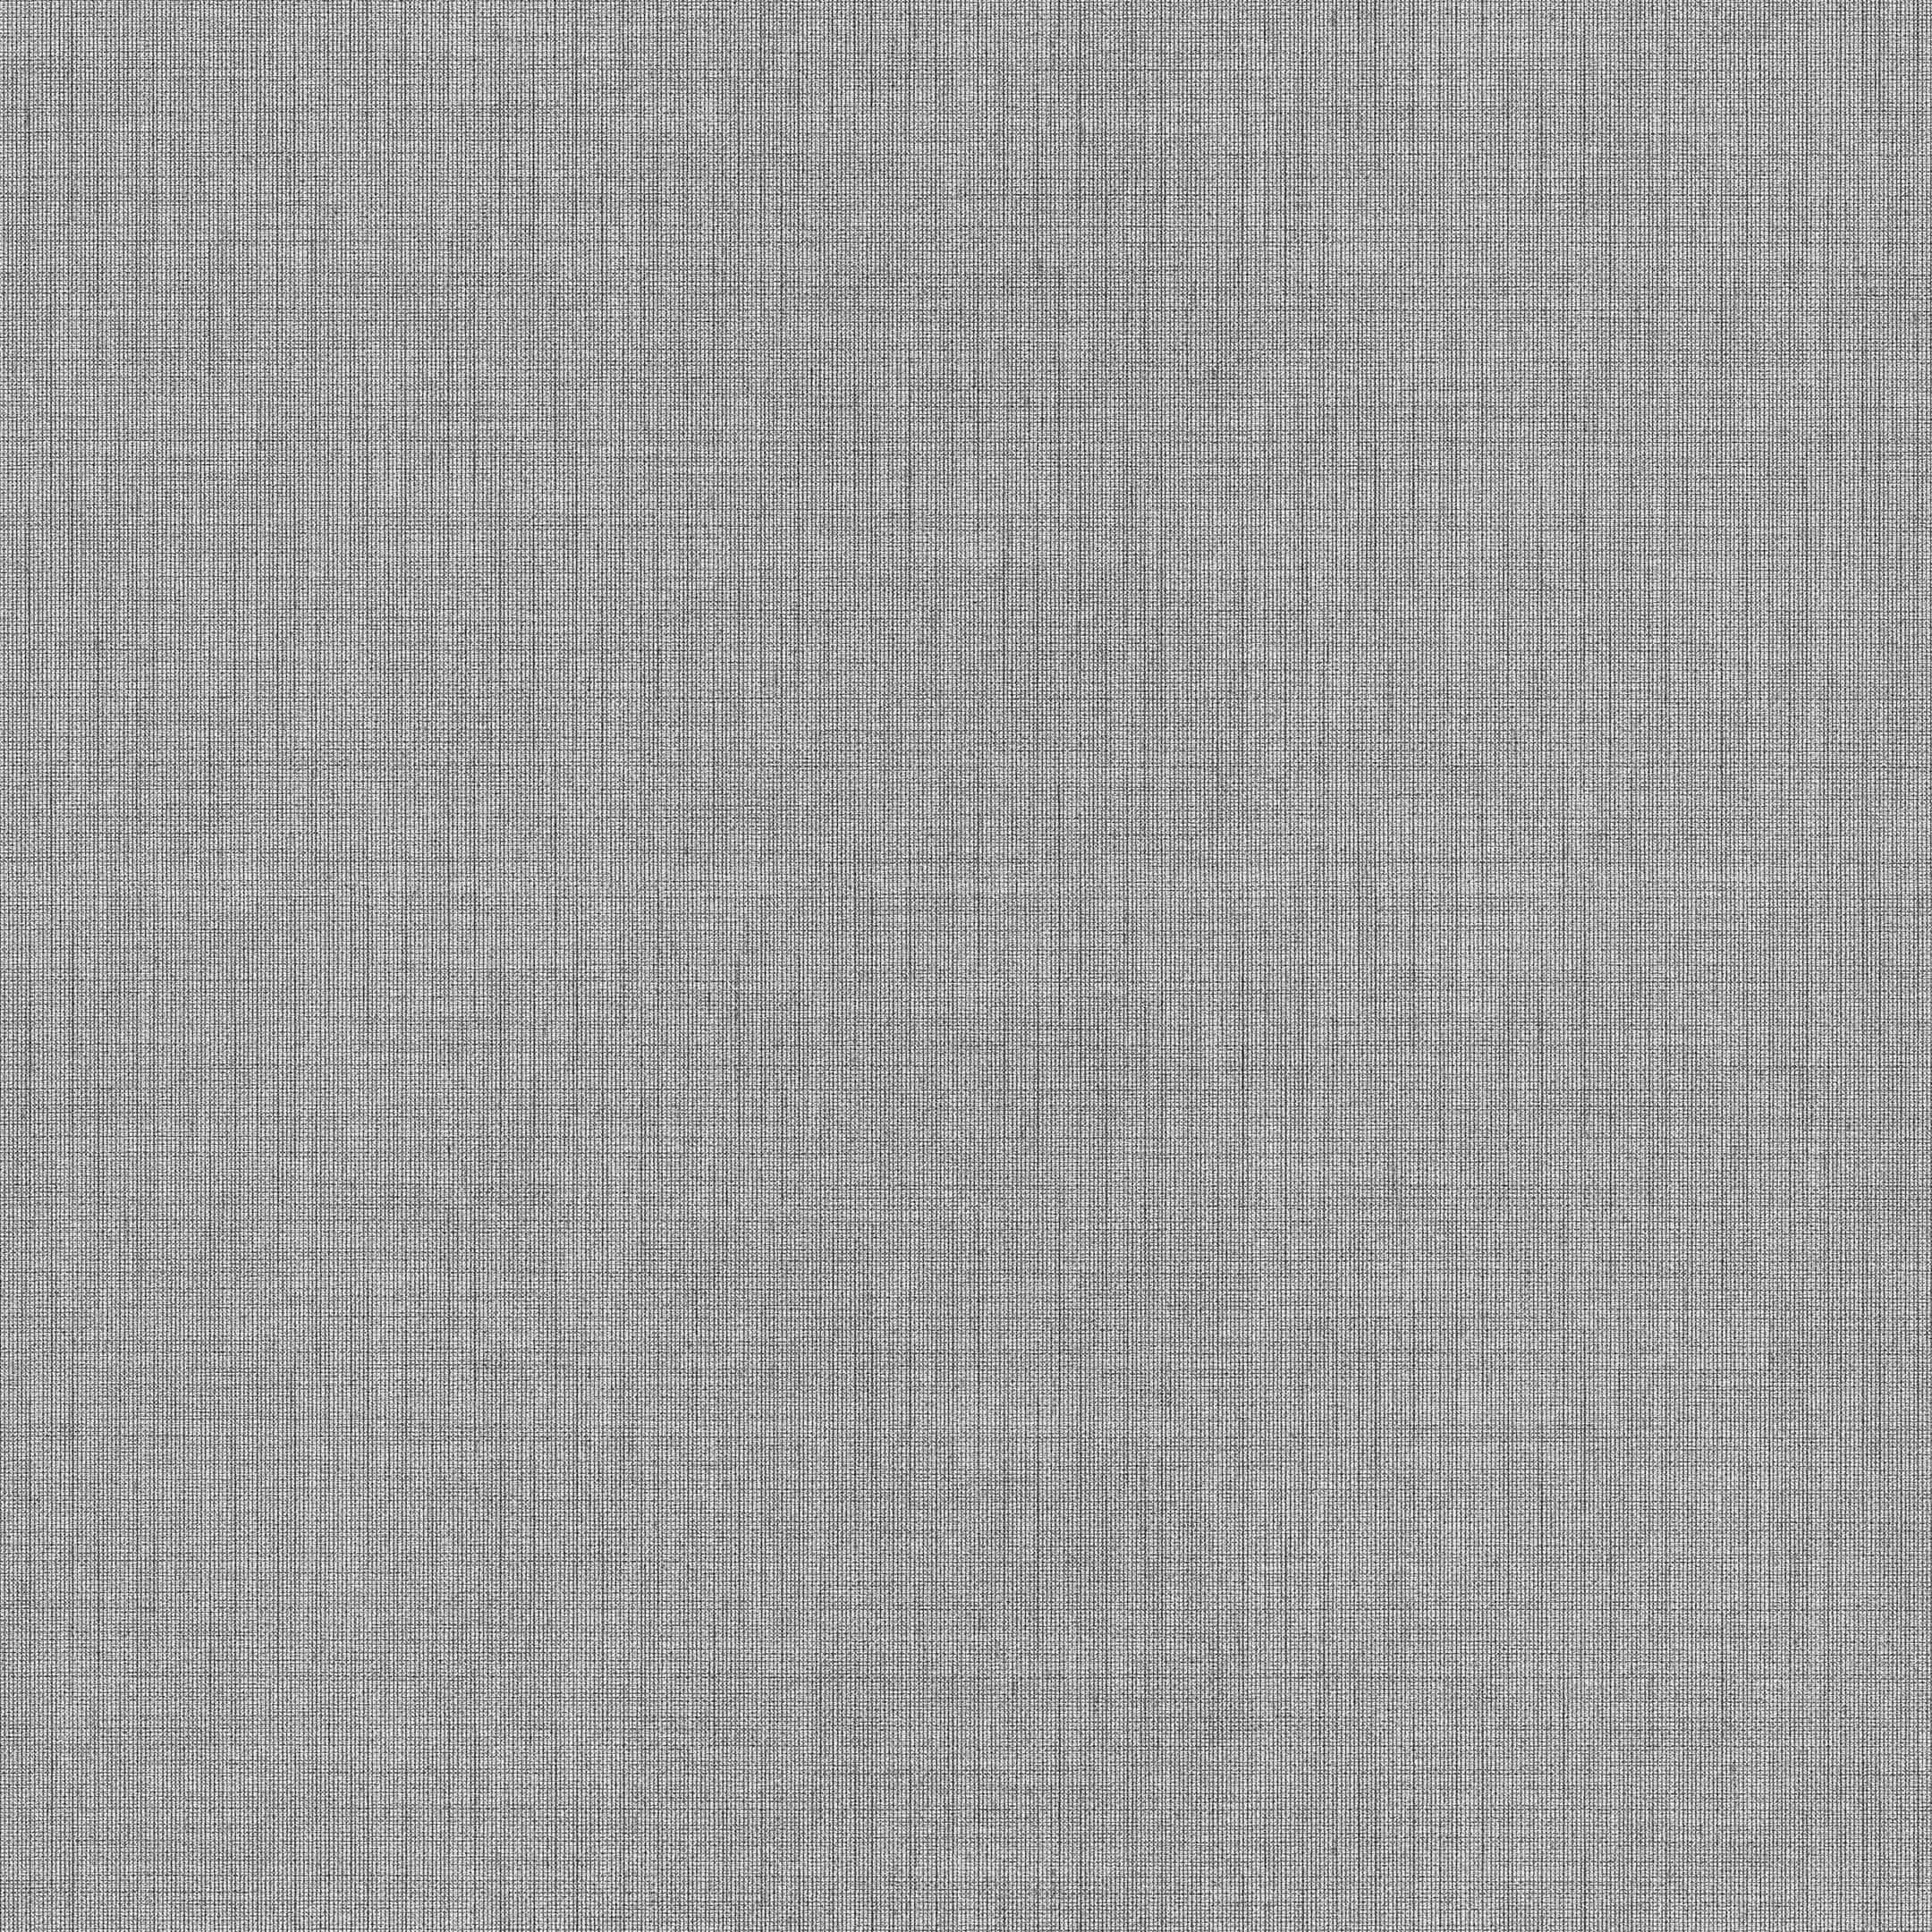 Обои виниловые на флизелиновой основе MaxWall Vila Rosa 159020-07 (1,06х10 м) r1 221 обои loymina rosa dragomirski